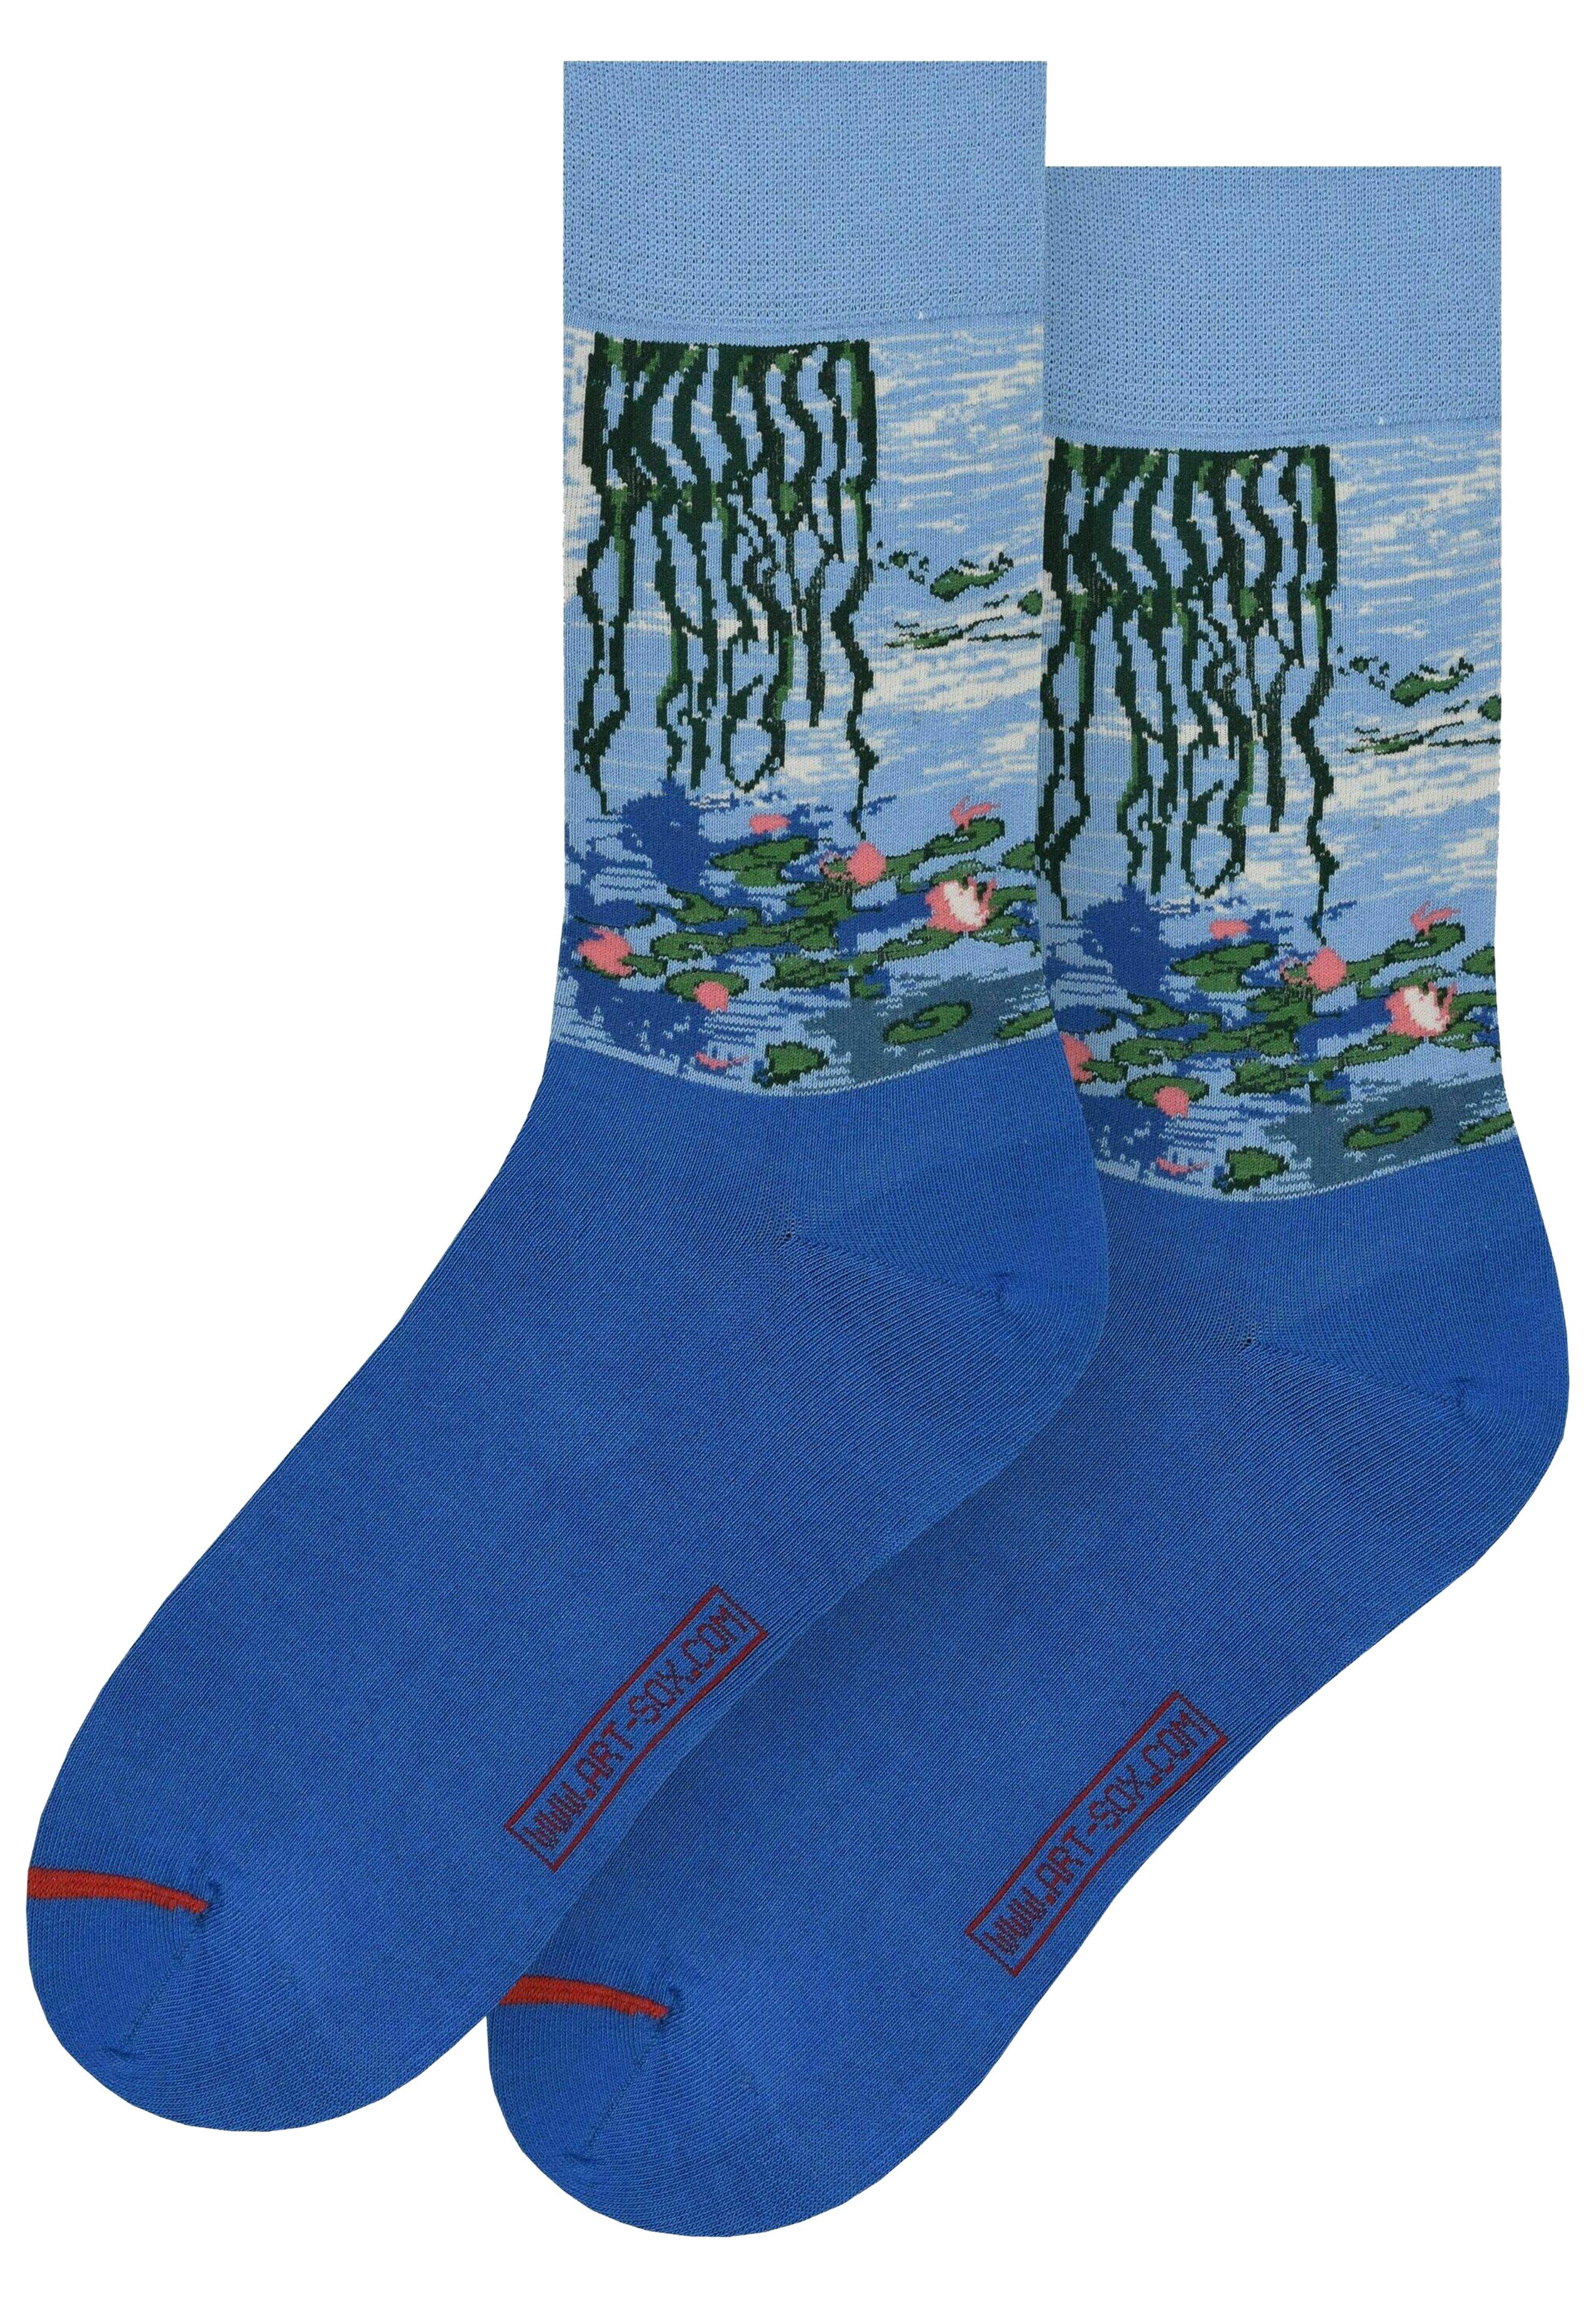 Femme CLAUDE MONET: WATER LILIES - Chaussettes